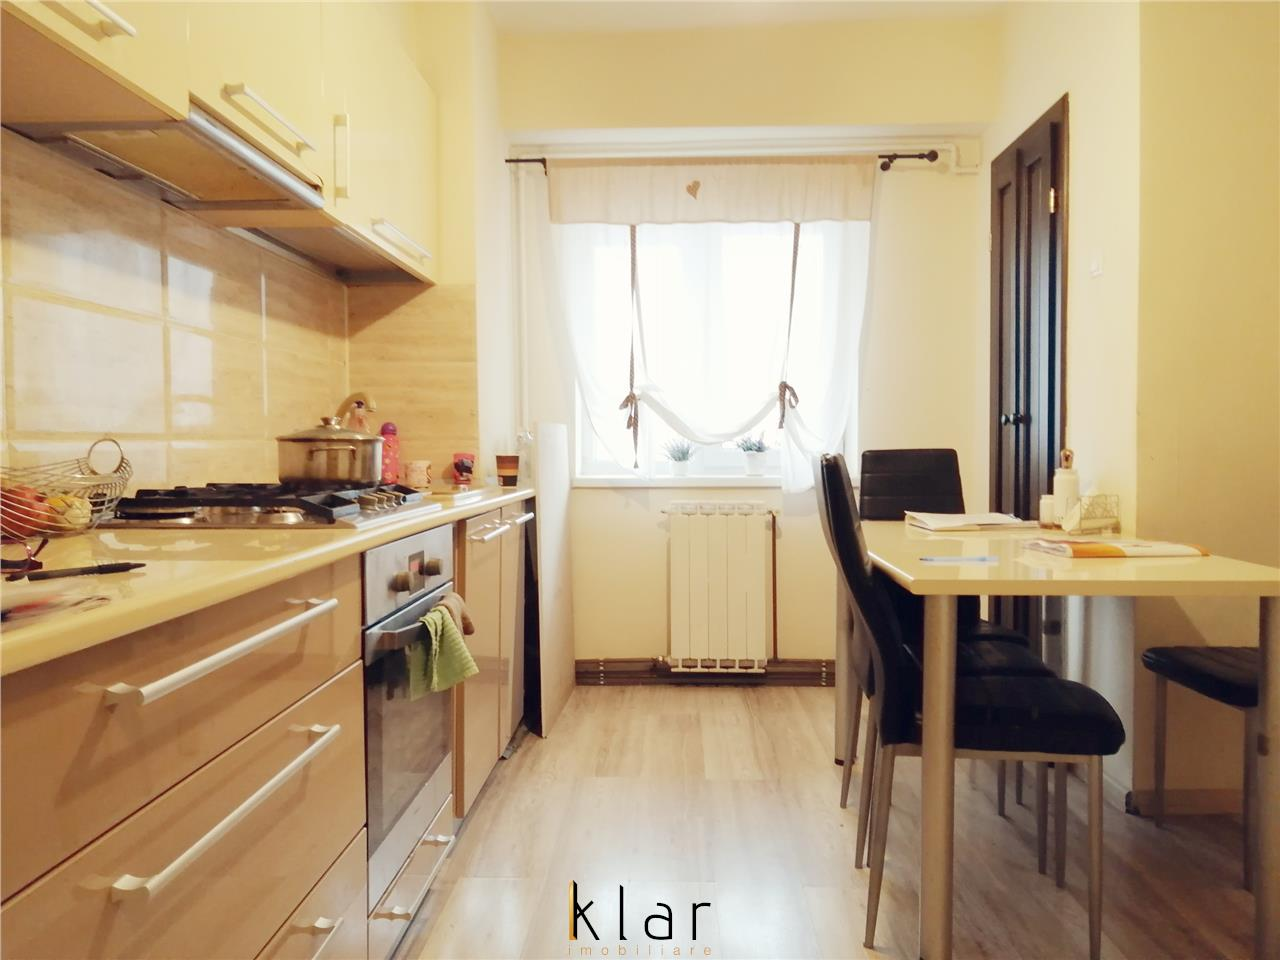 Apartament 2 camere decomandat, confort marit, zona Iulius Mall!